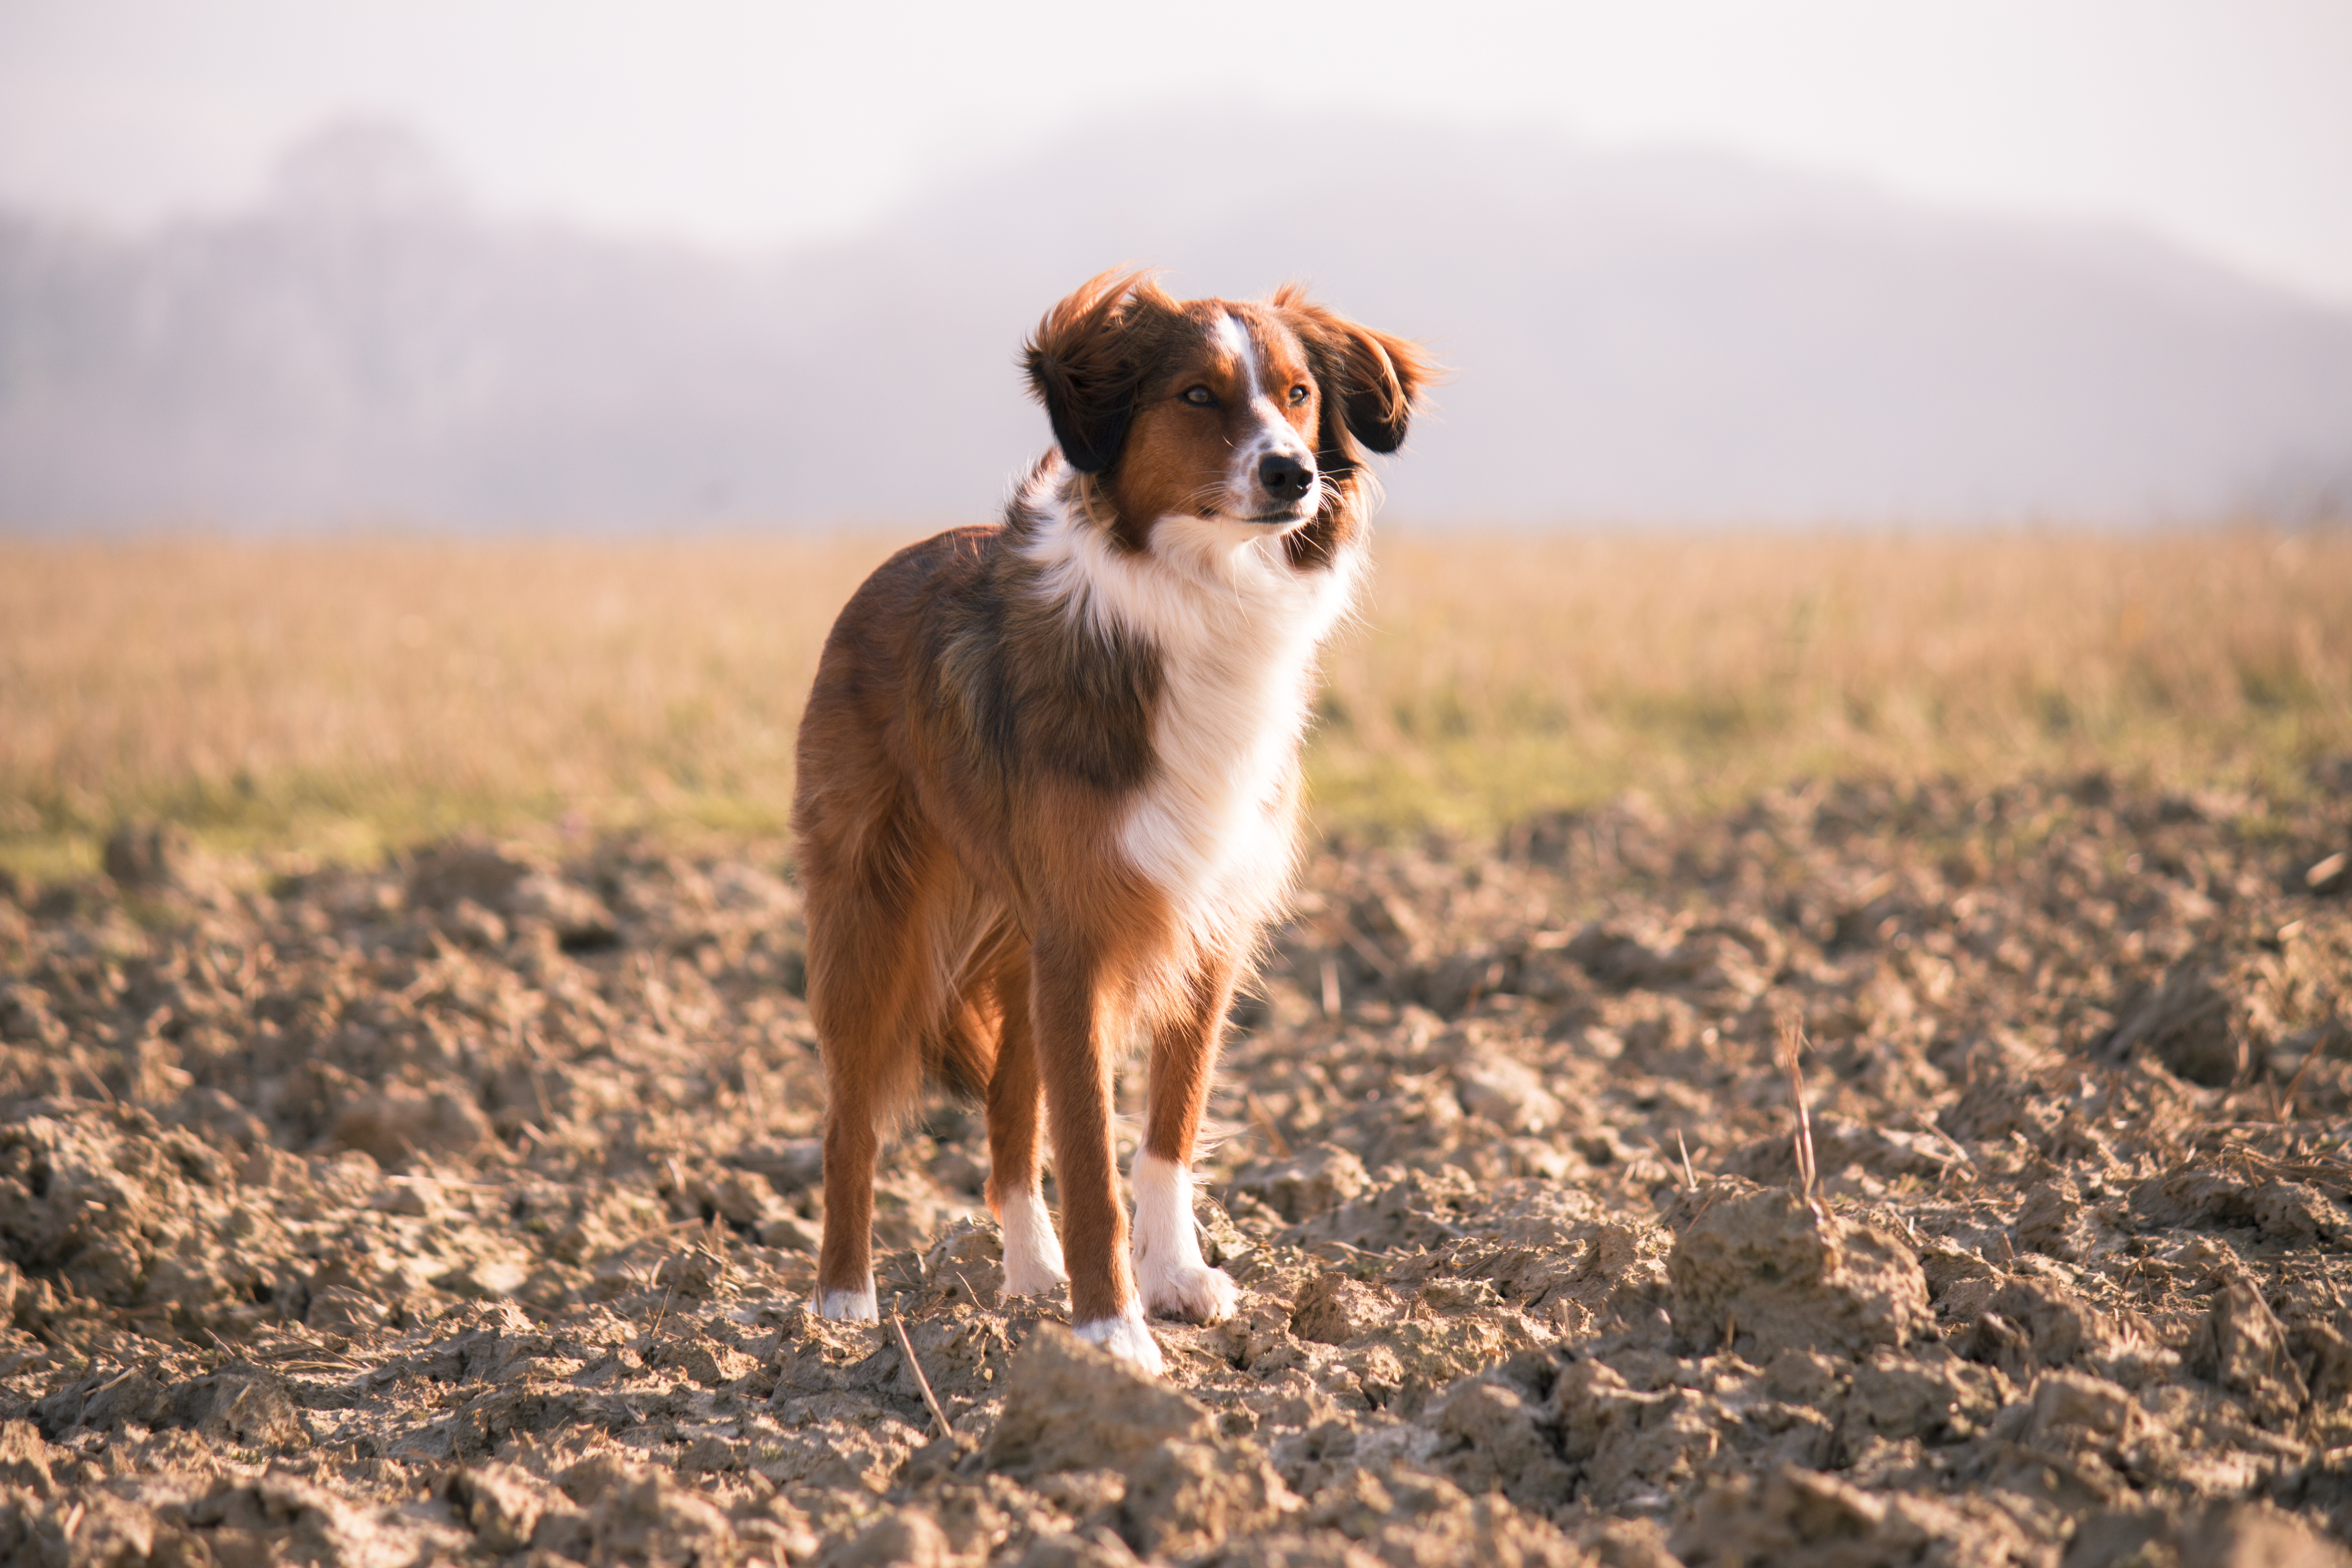 Scruffy puppy dog photo